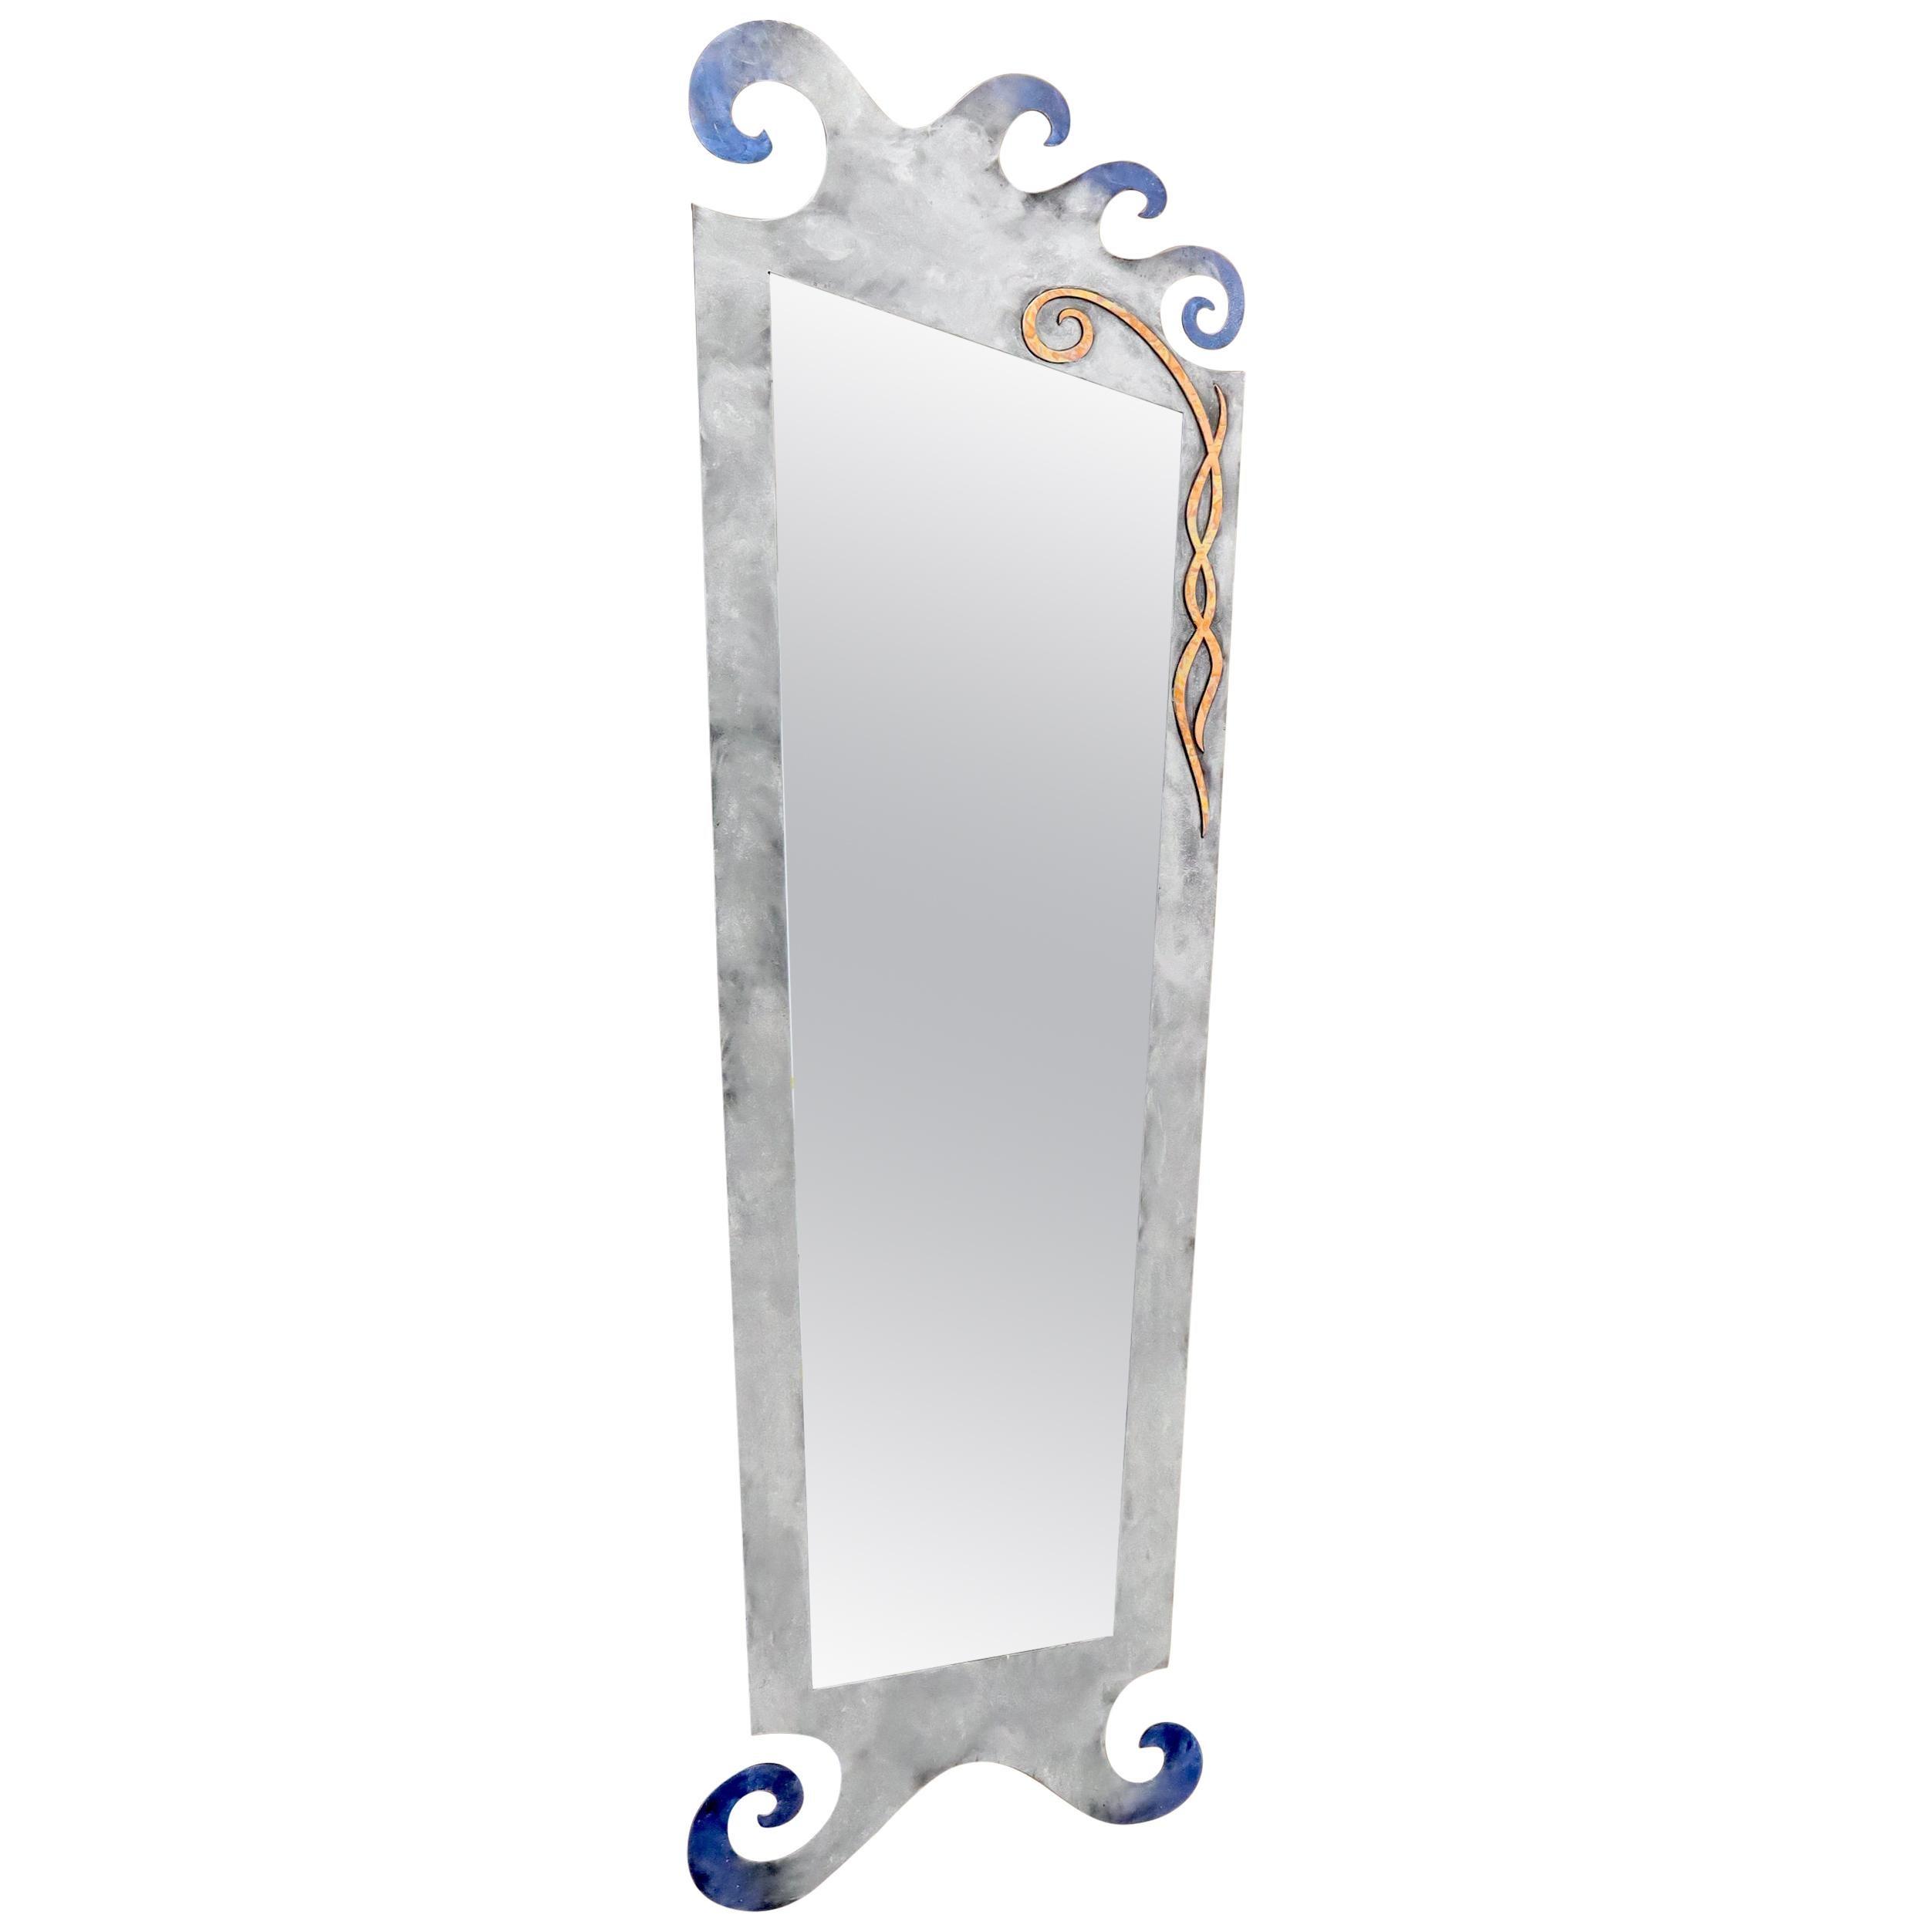 Large Decorative Metal Frame Floor Standing Wall Mirror